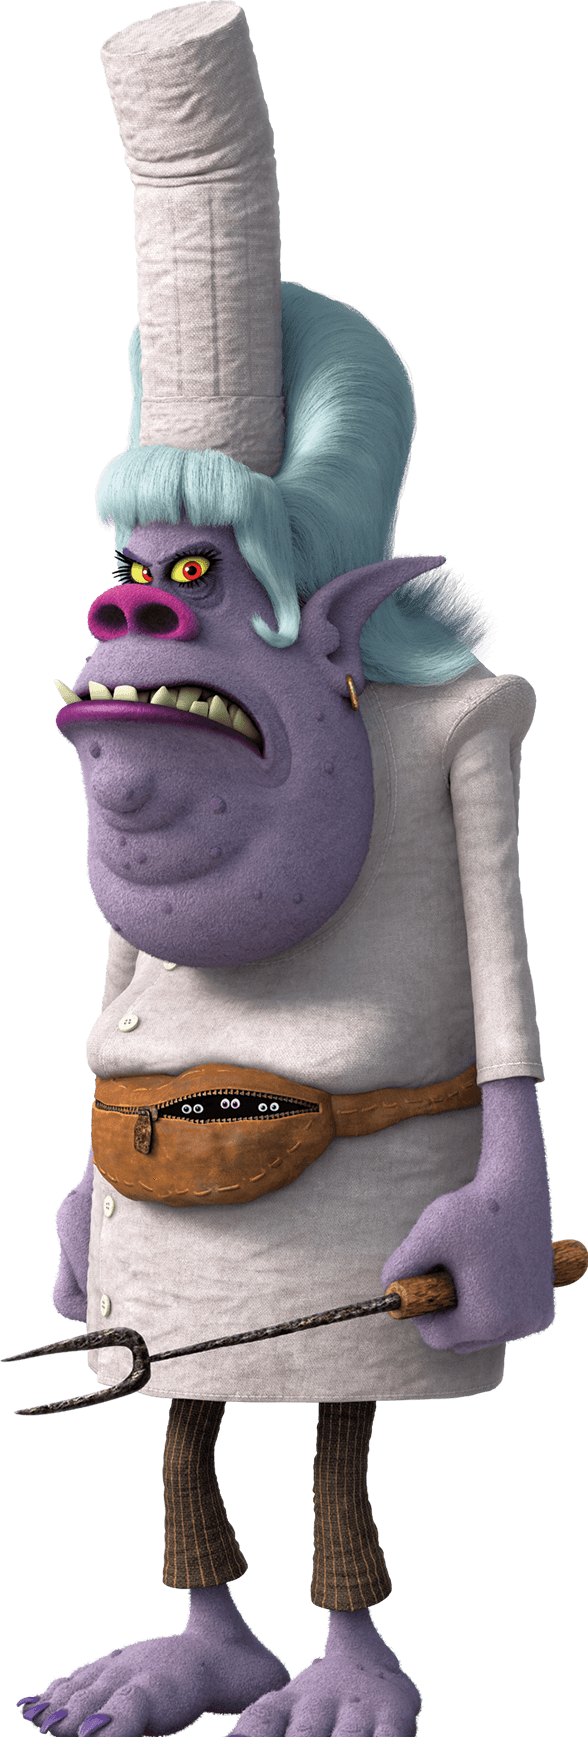 Chef bergen de la pelicula Trolls